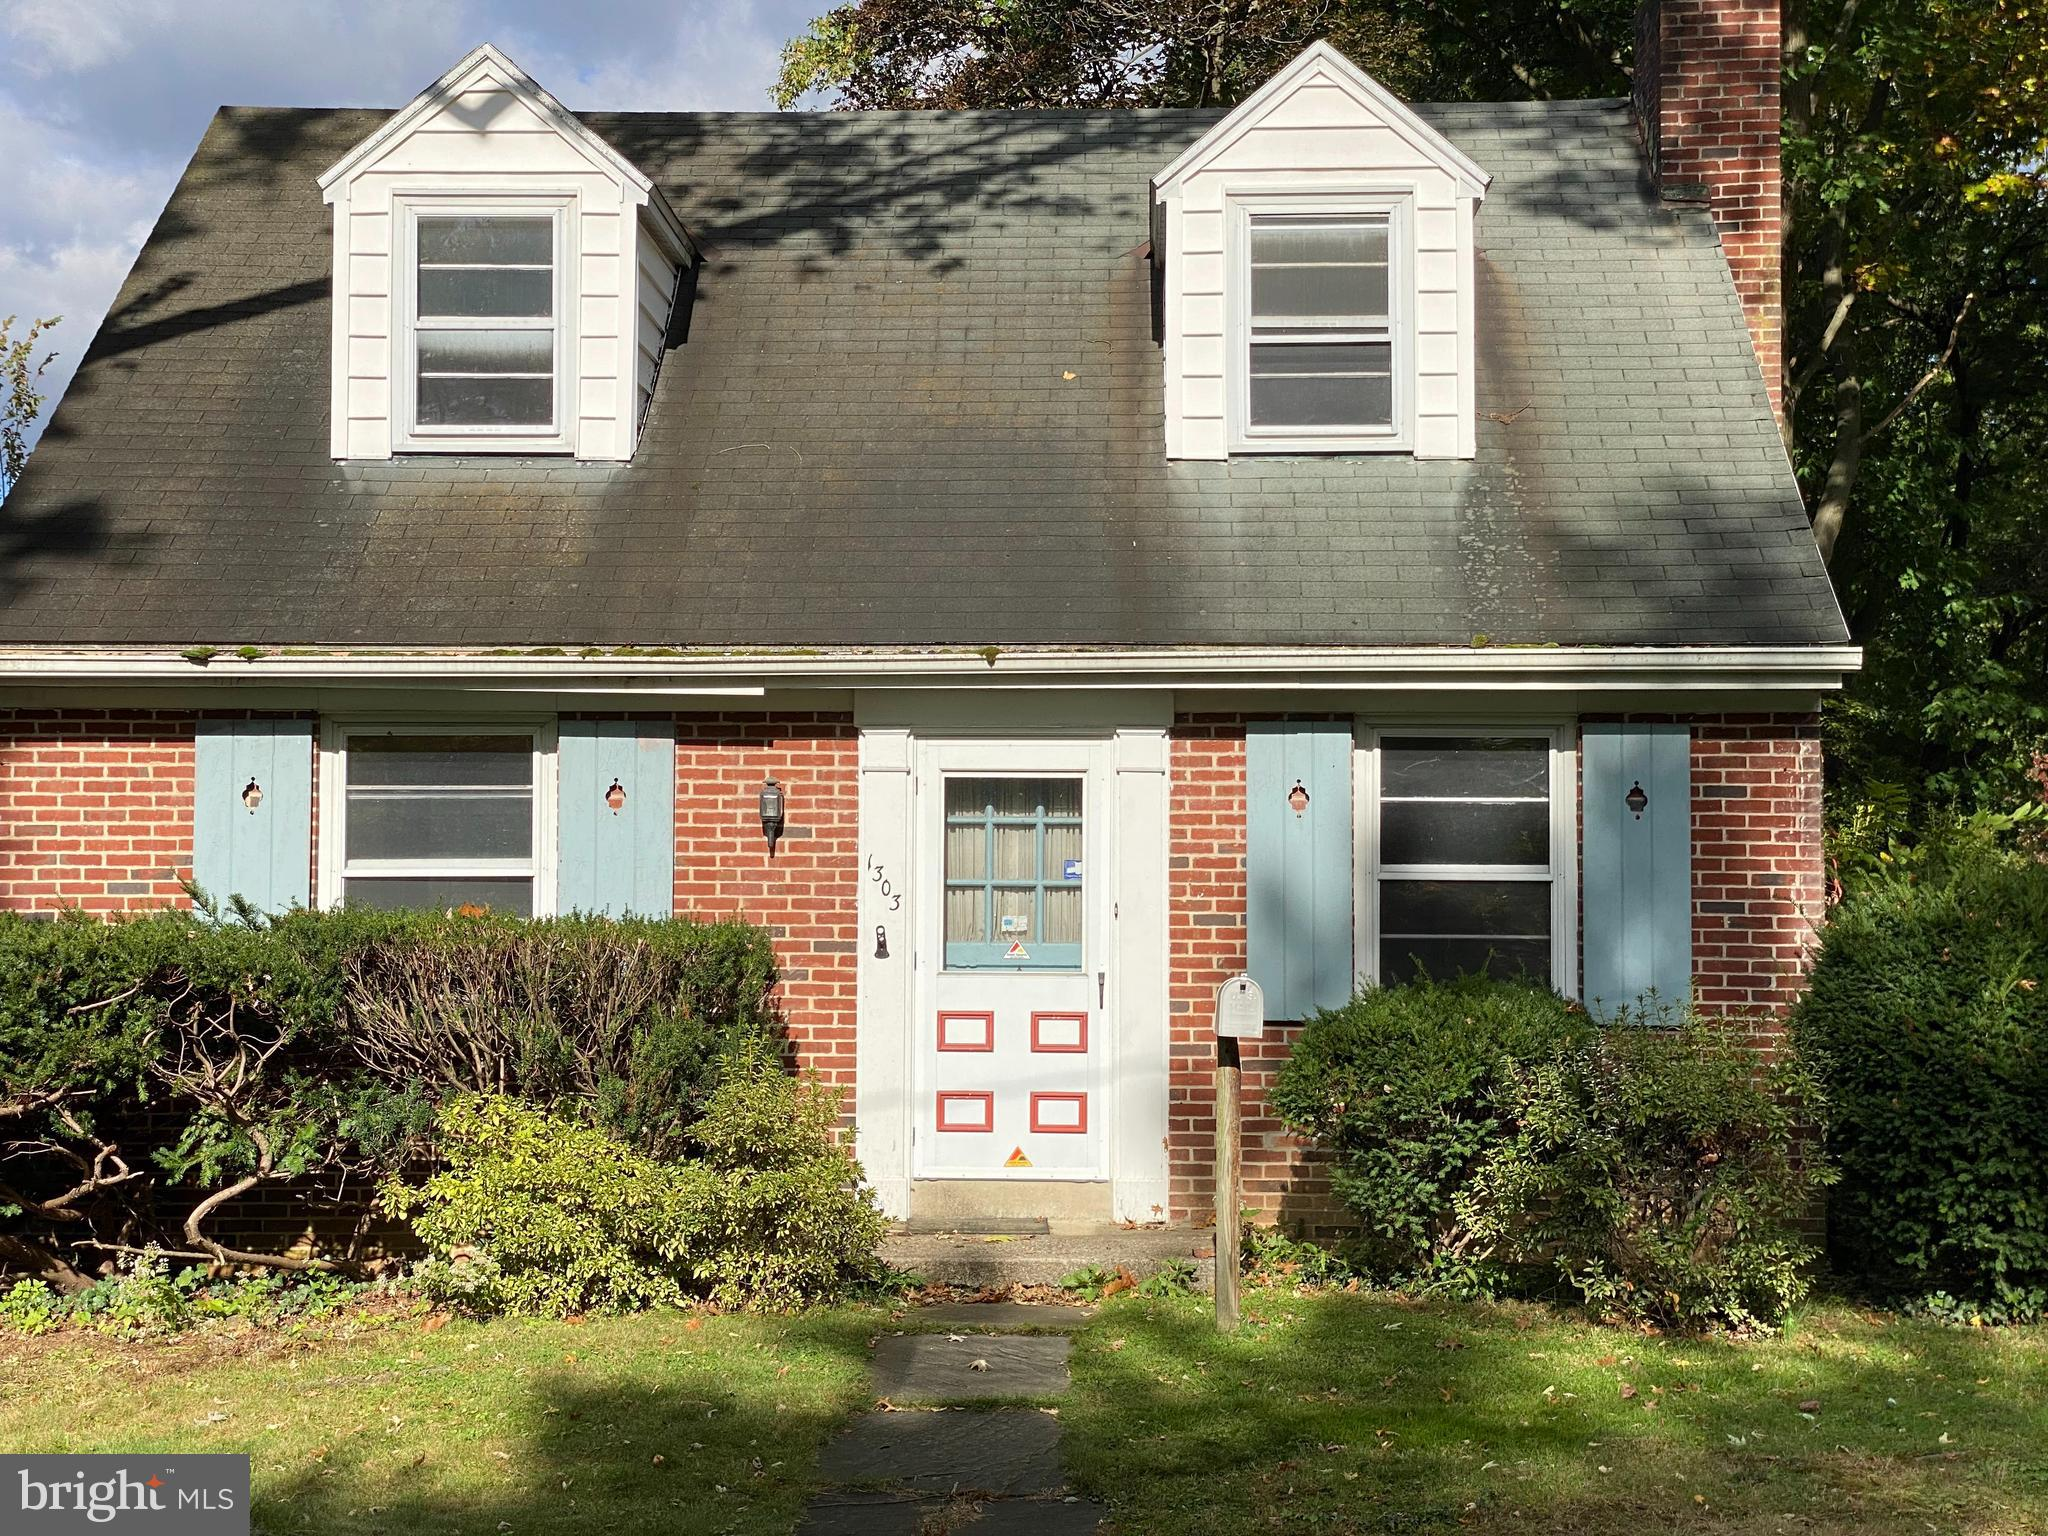 1301 Cheves Place, Lancaster, PA 17603